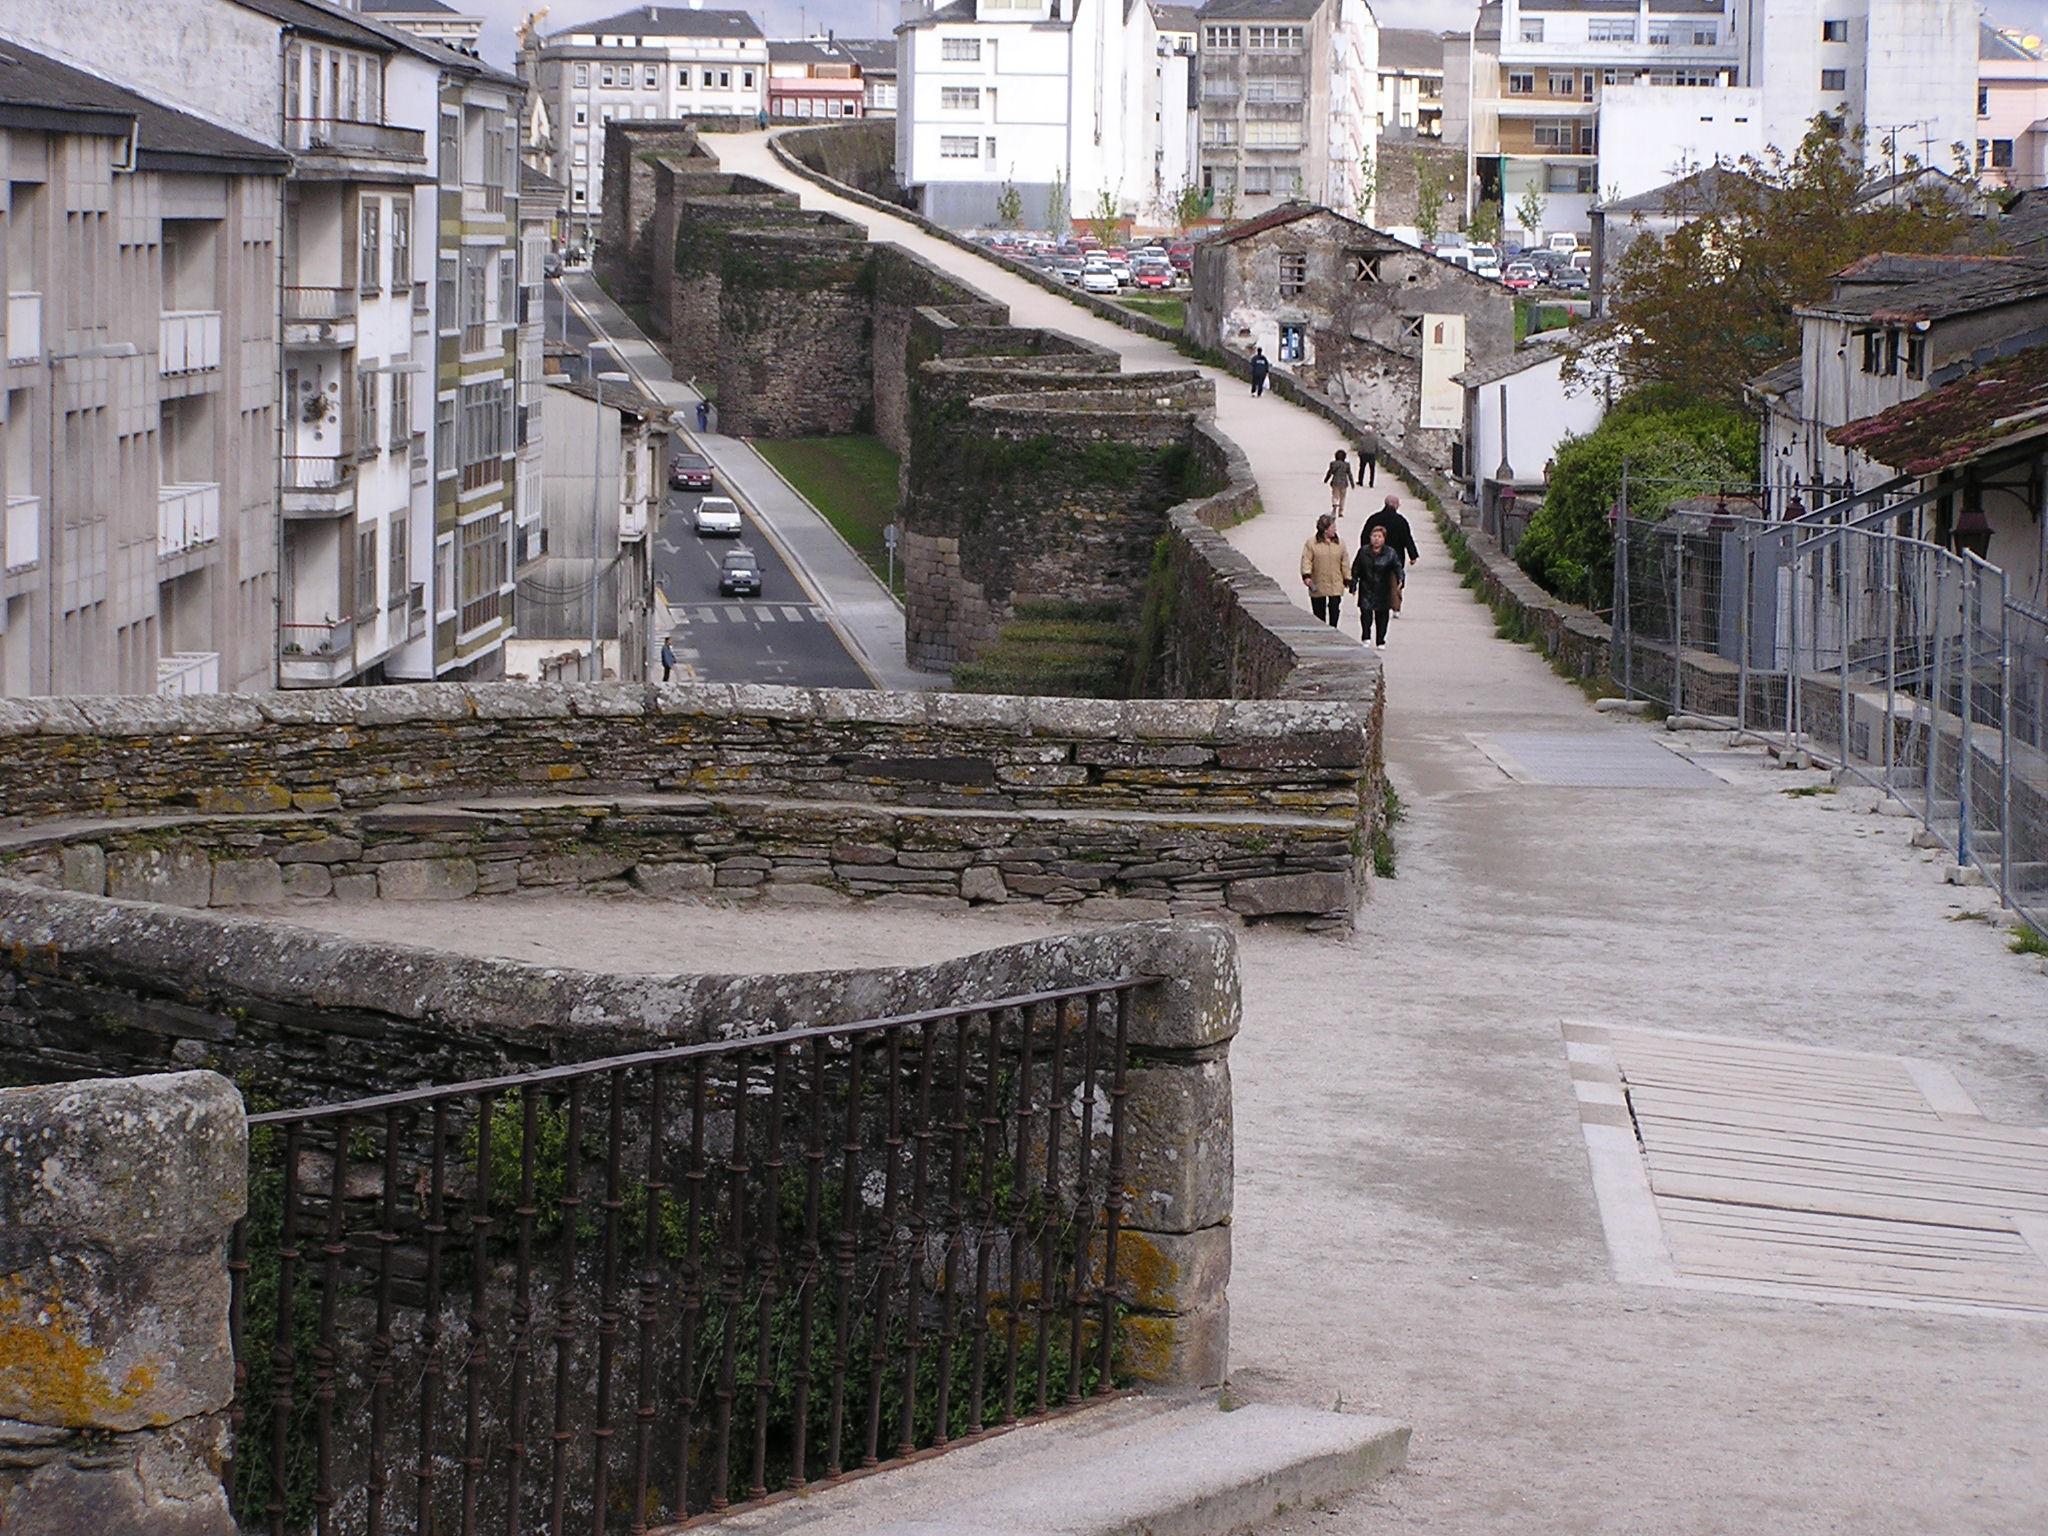 Lugo adarve de la Muralla